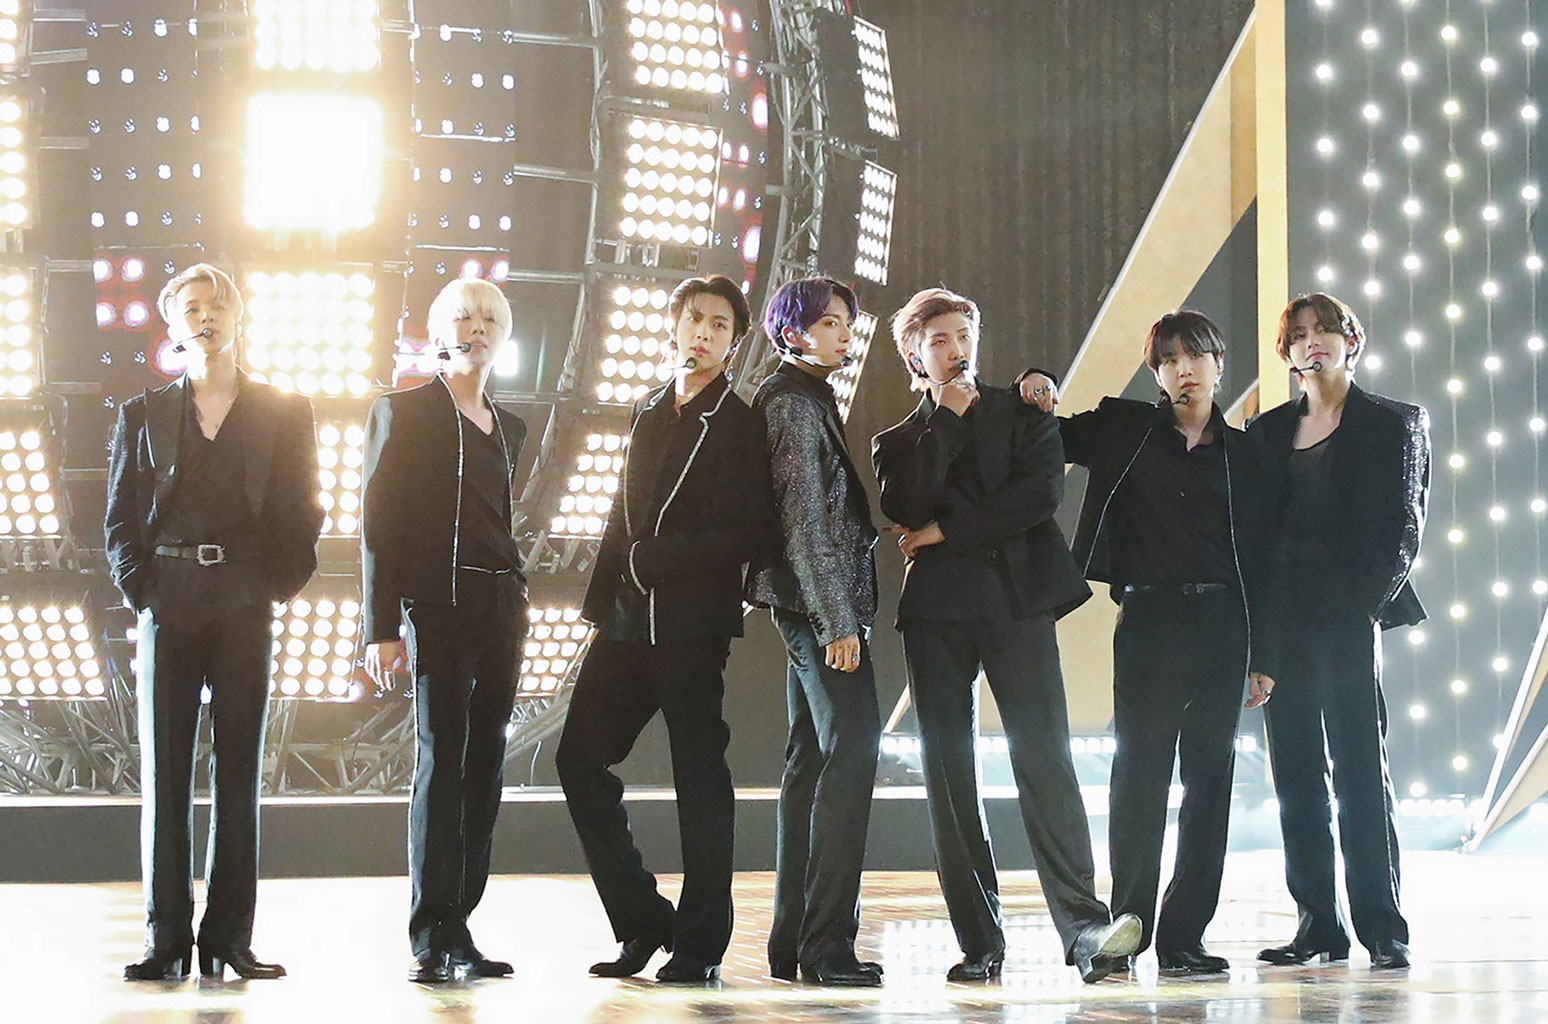 BTS Talk Ed Sheeran, Grammys and More on 'Fallon': Watch